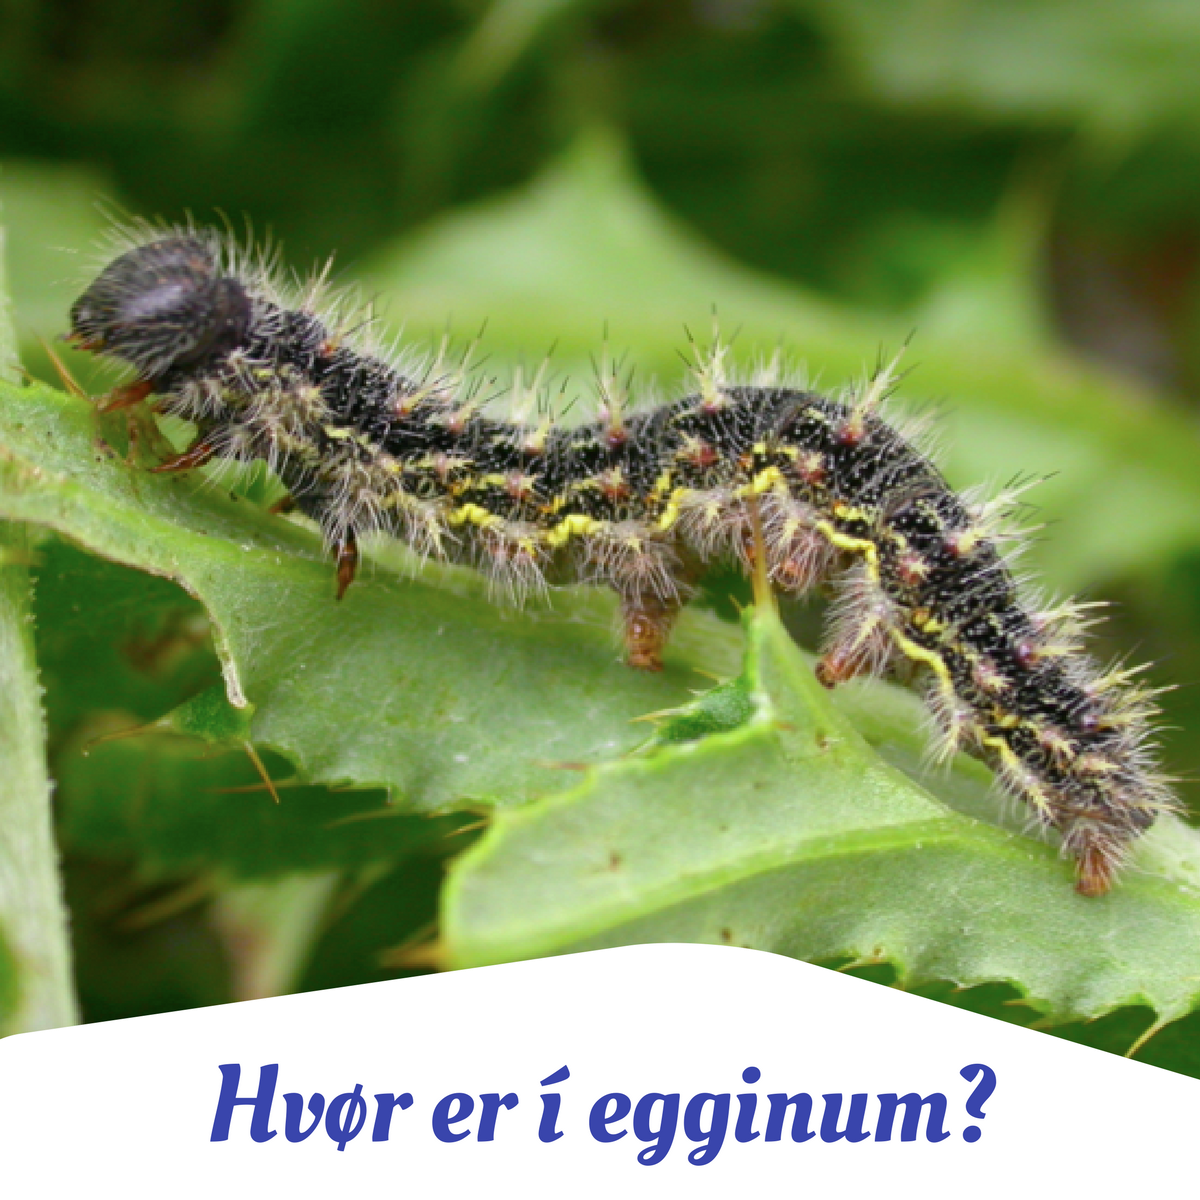 egginum.png